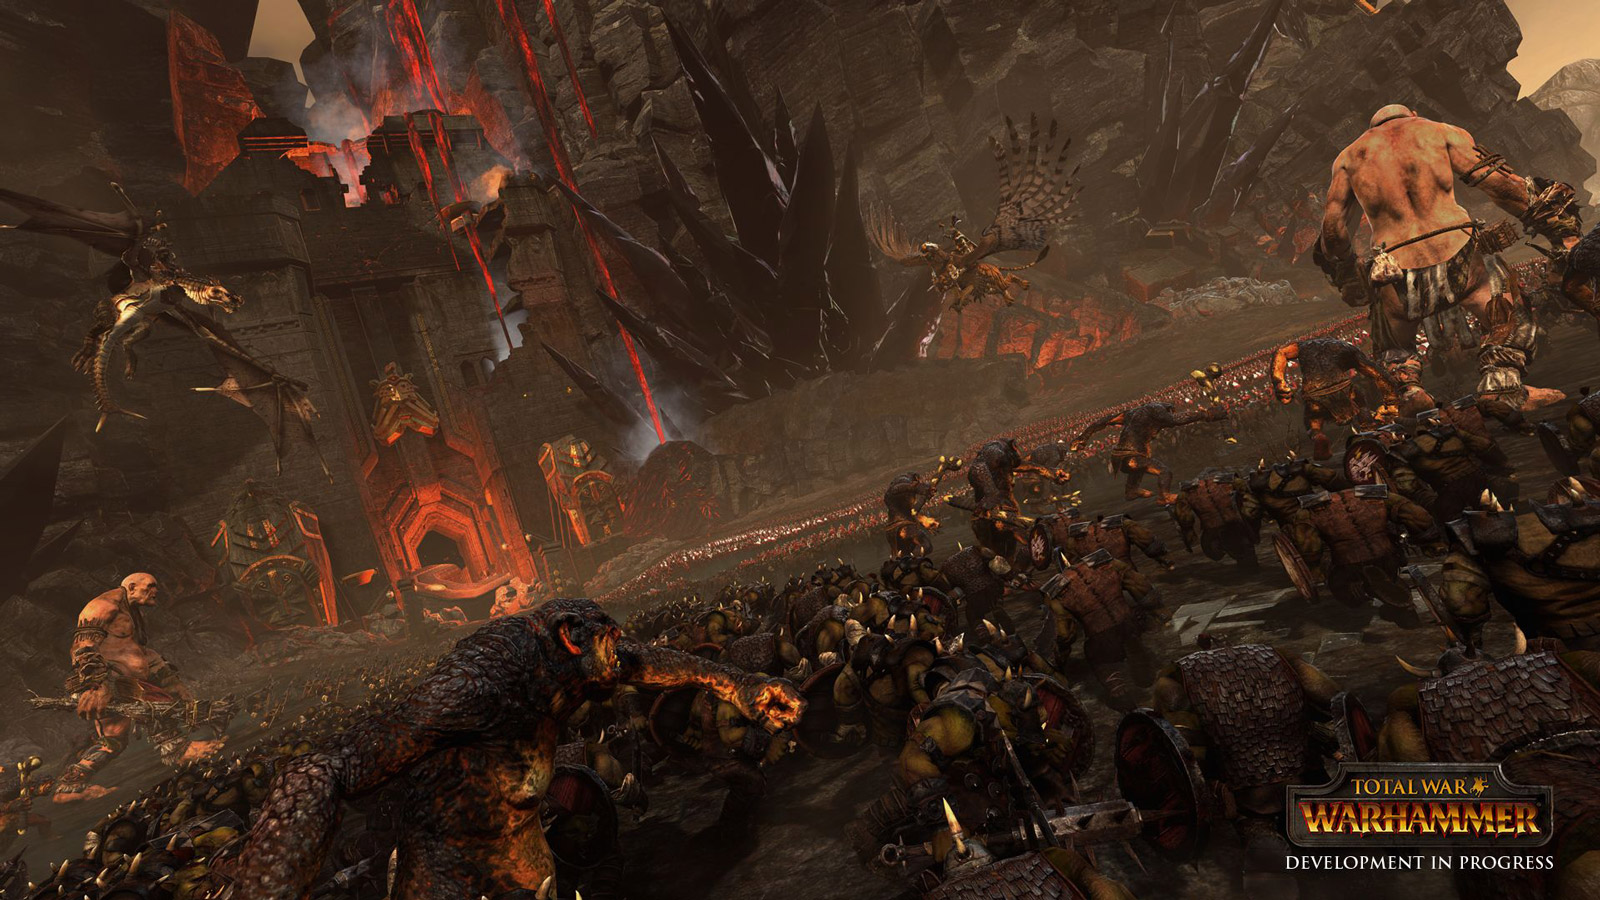 Free Total War: Warhammer Wallpaper in 1600x900